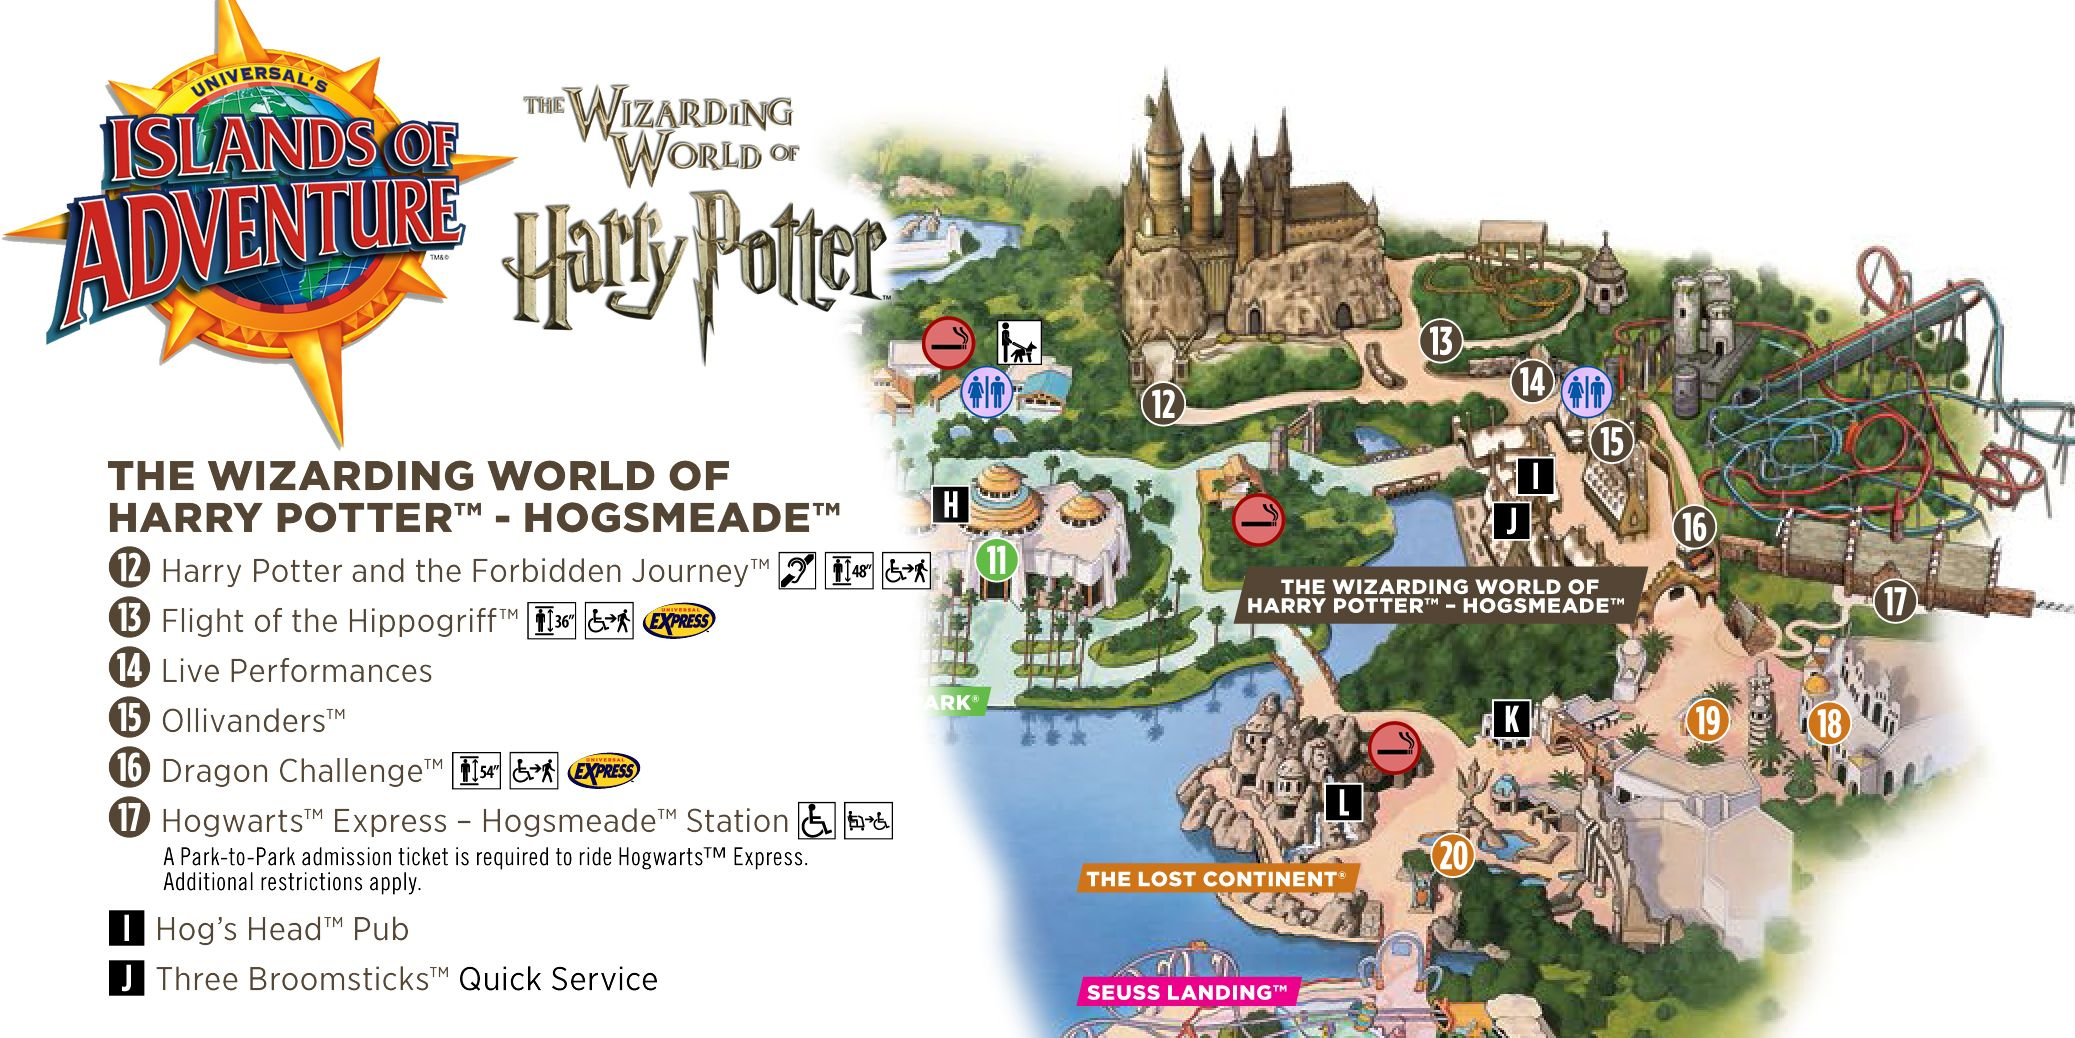 Universal S Islands Of Adventure Hogsmeade Map Theme Park Map Universal Islands Of Adventure Hogsmeade